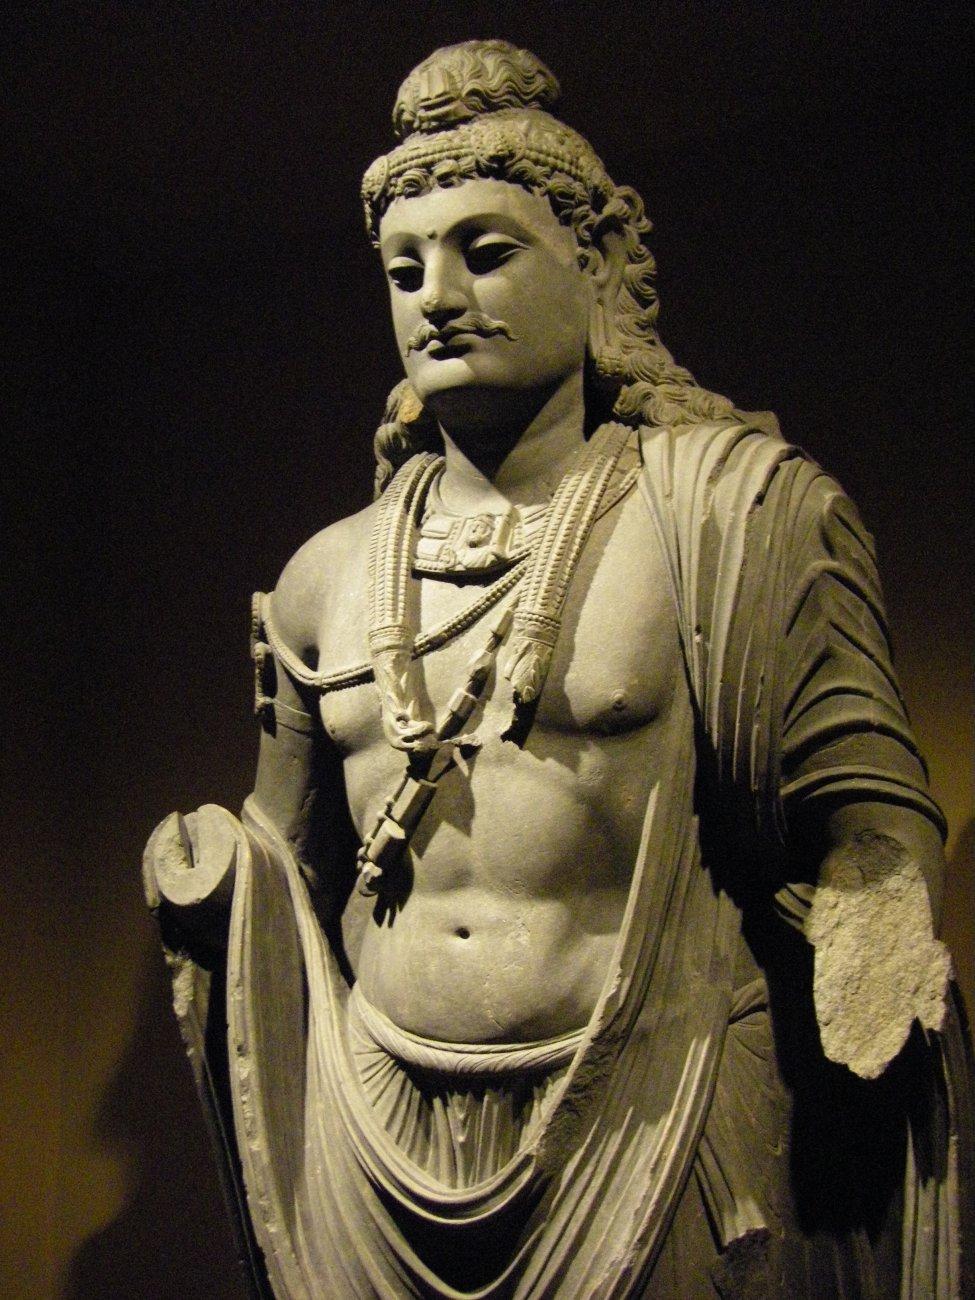 a-bodhisattva-pakistan-ancient-gandhara-2nd-3rd-century.jpg